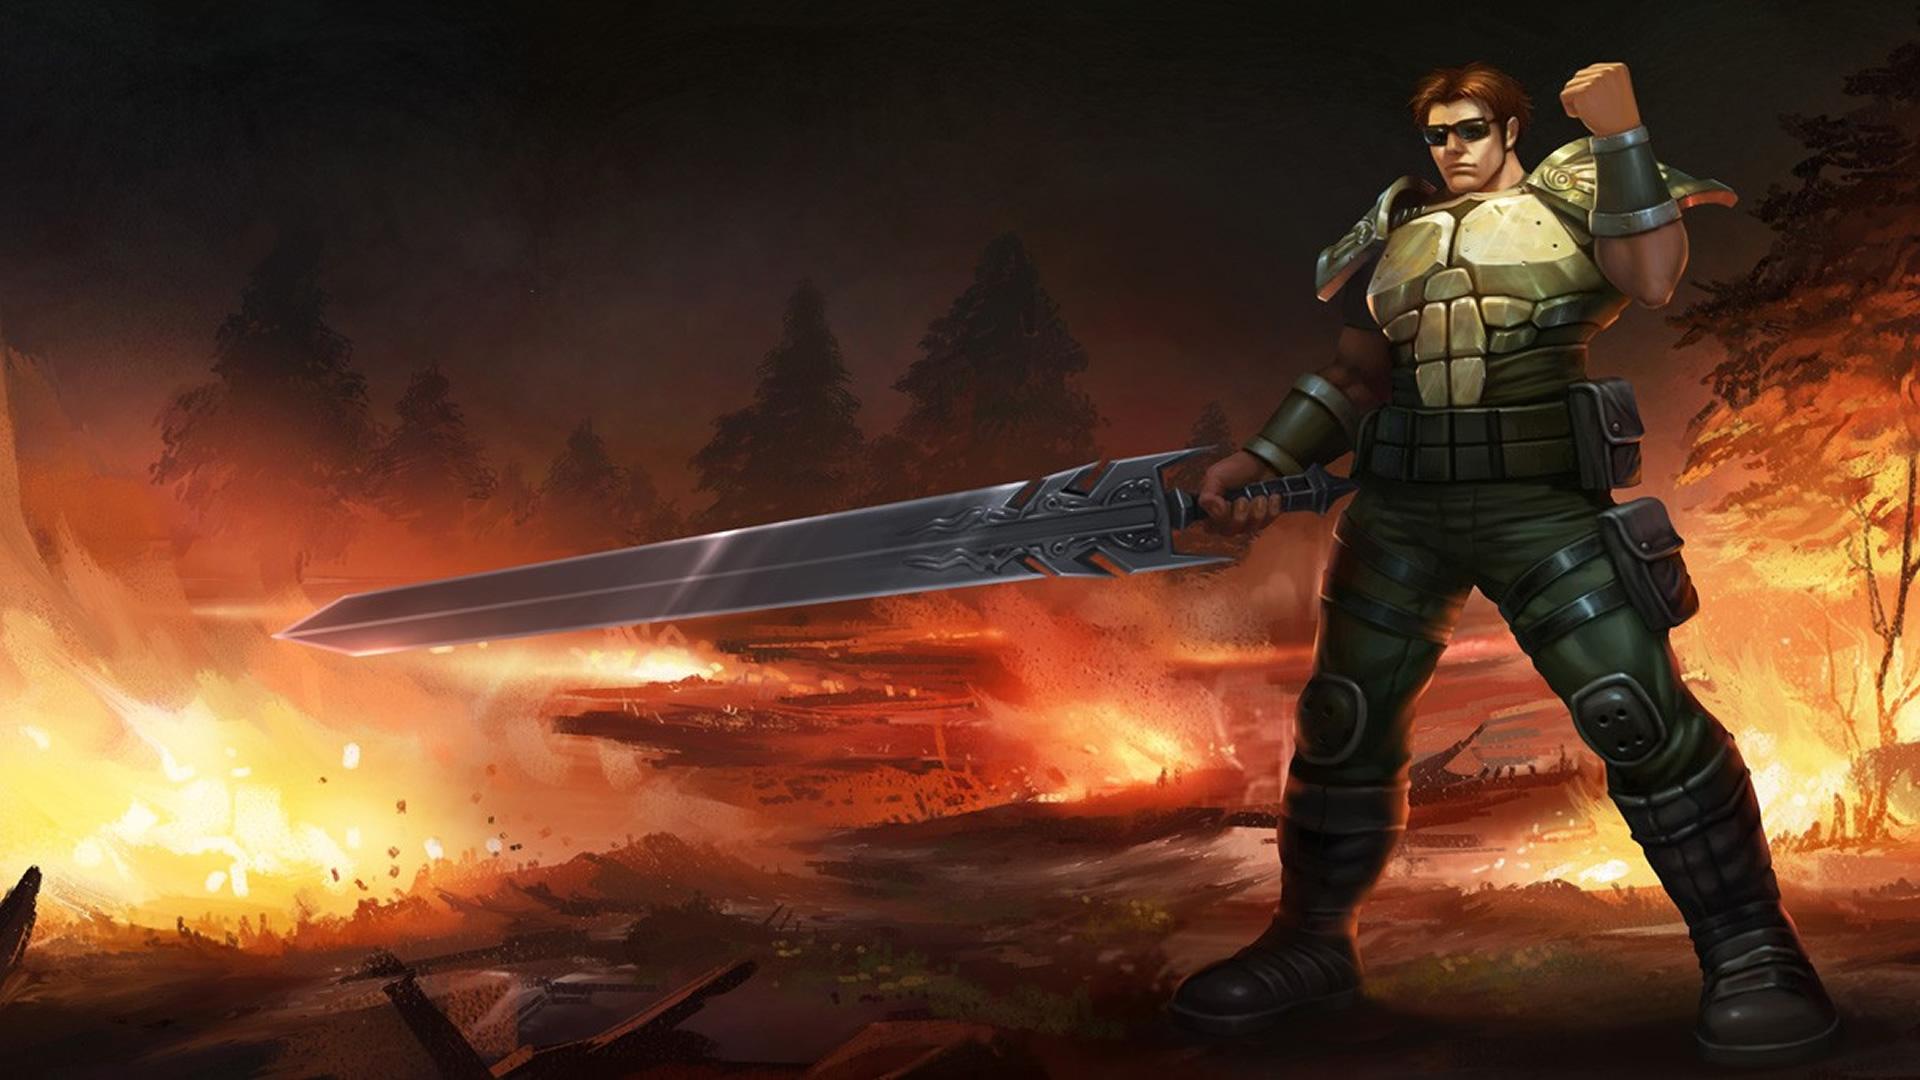 Commando Garen Chinese Wallpaper - LeagueSplash